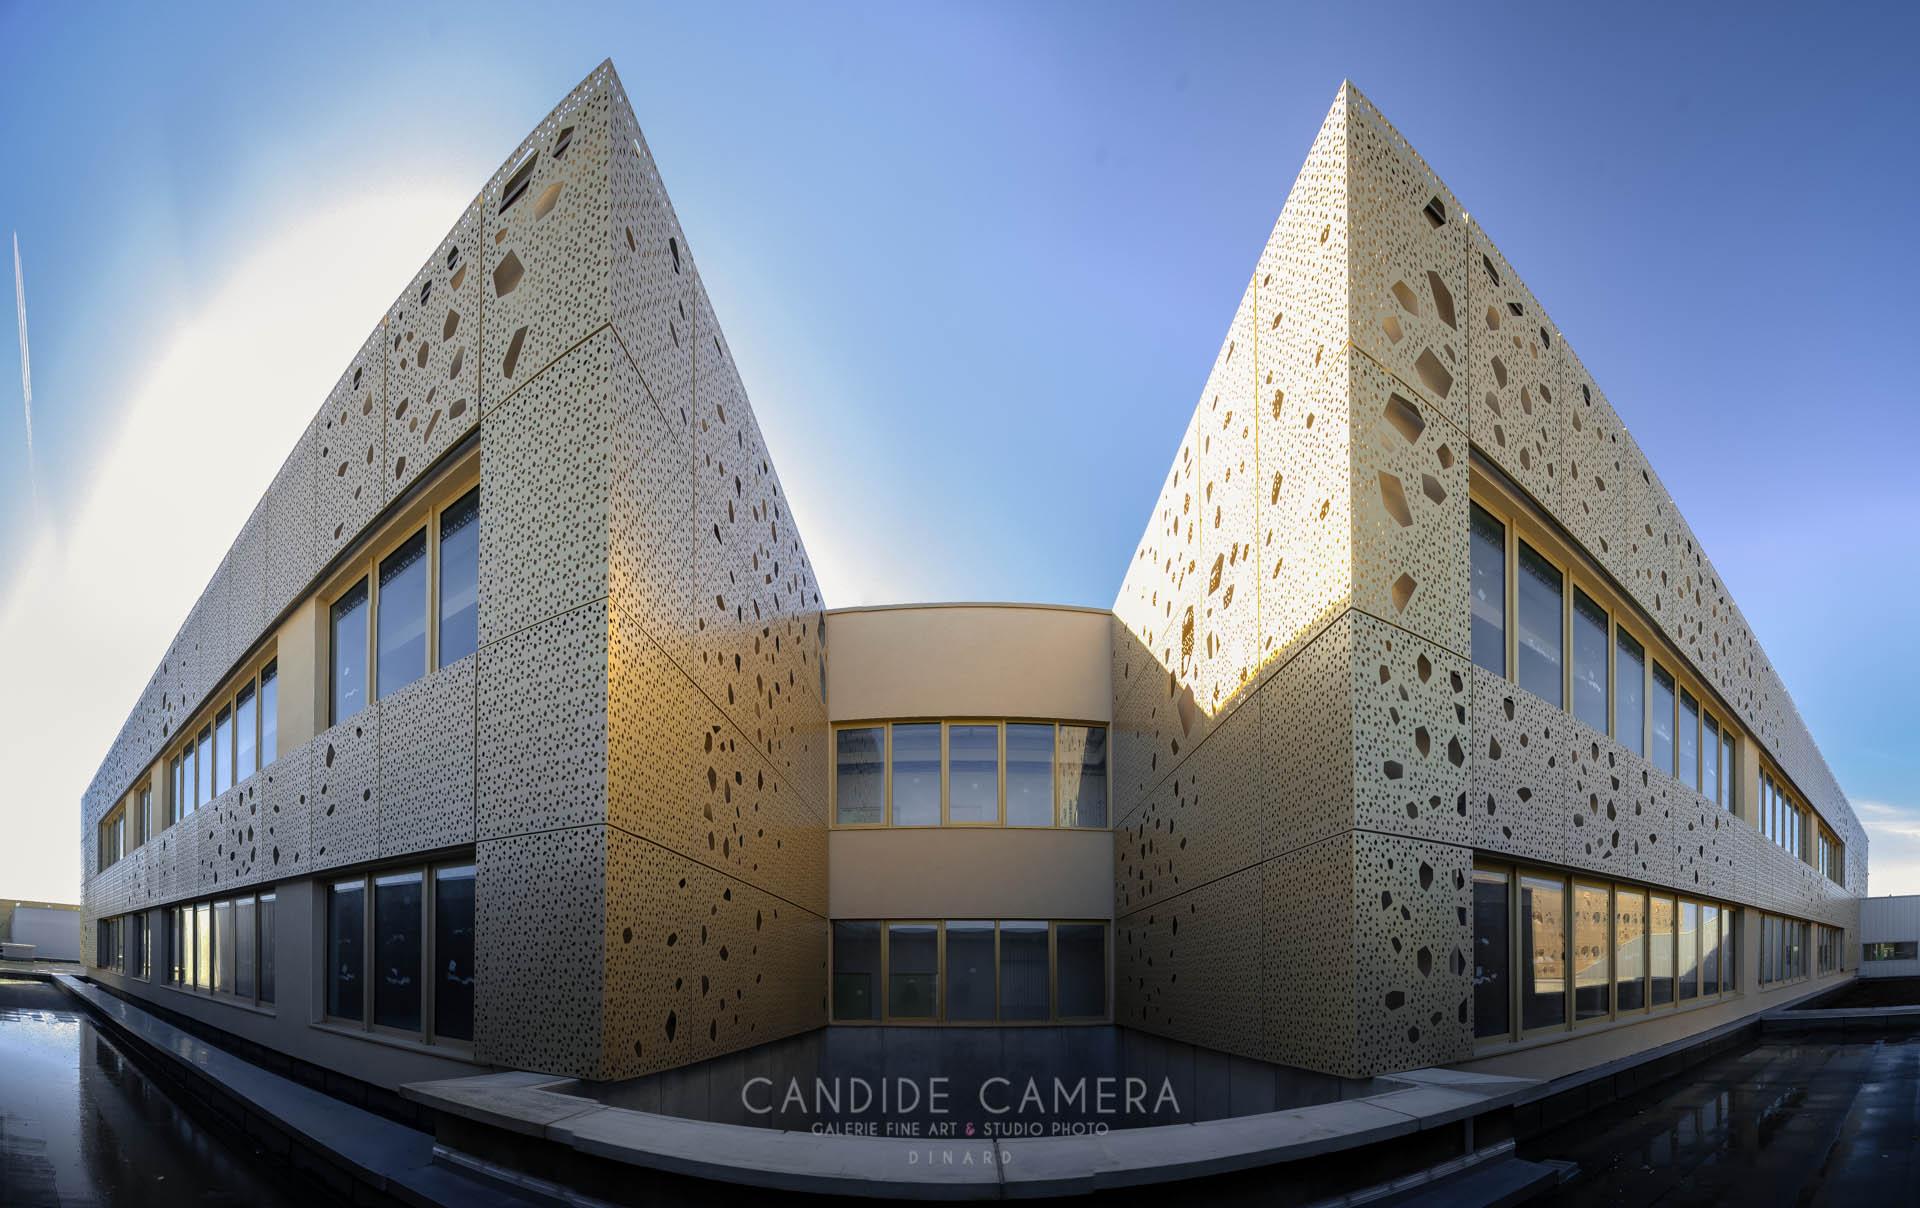 GALERIE_CANDIDE_CAMERA_PHOTOGRAPHE_ARCHITECTURE TCIN